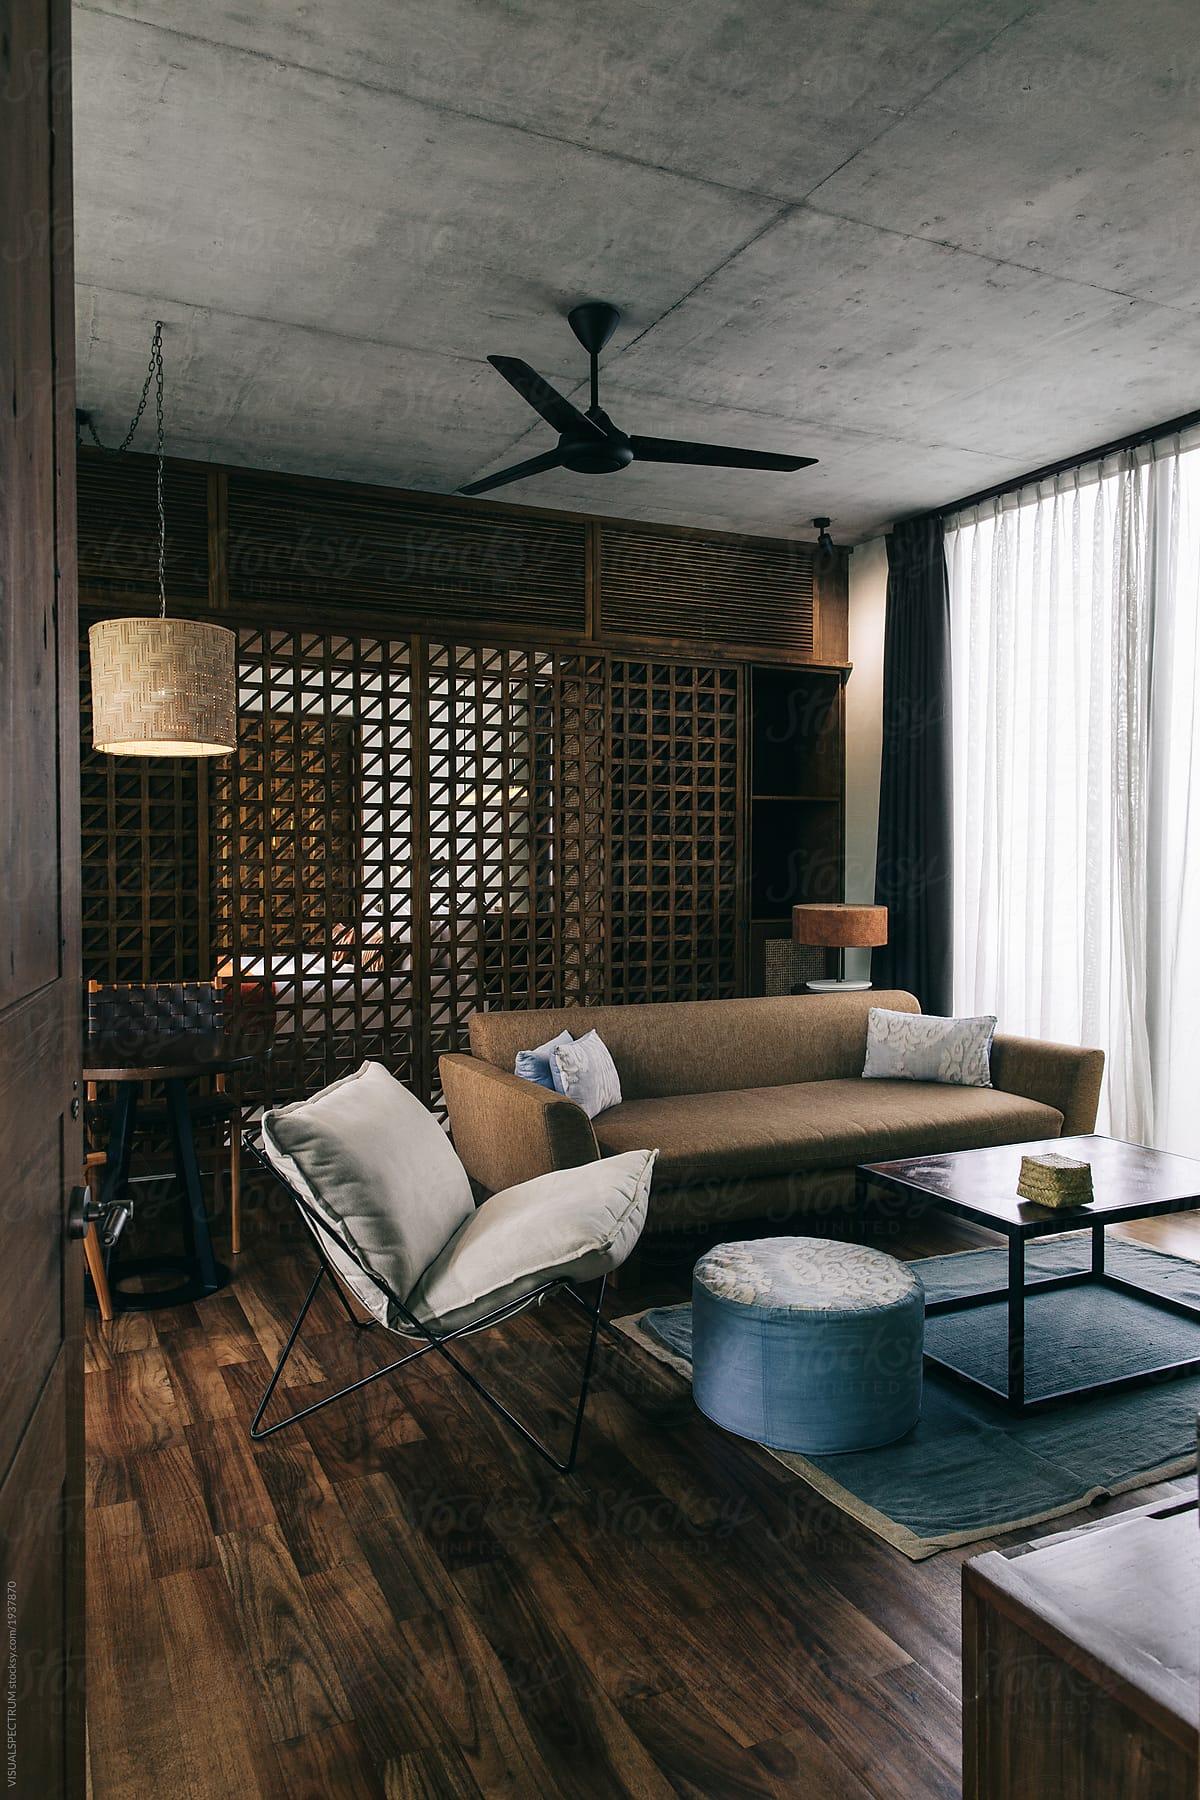 Interior design design furniture in hip modern hotel suite by visualspectrum for stocksy united